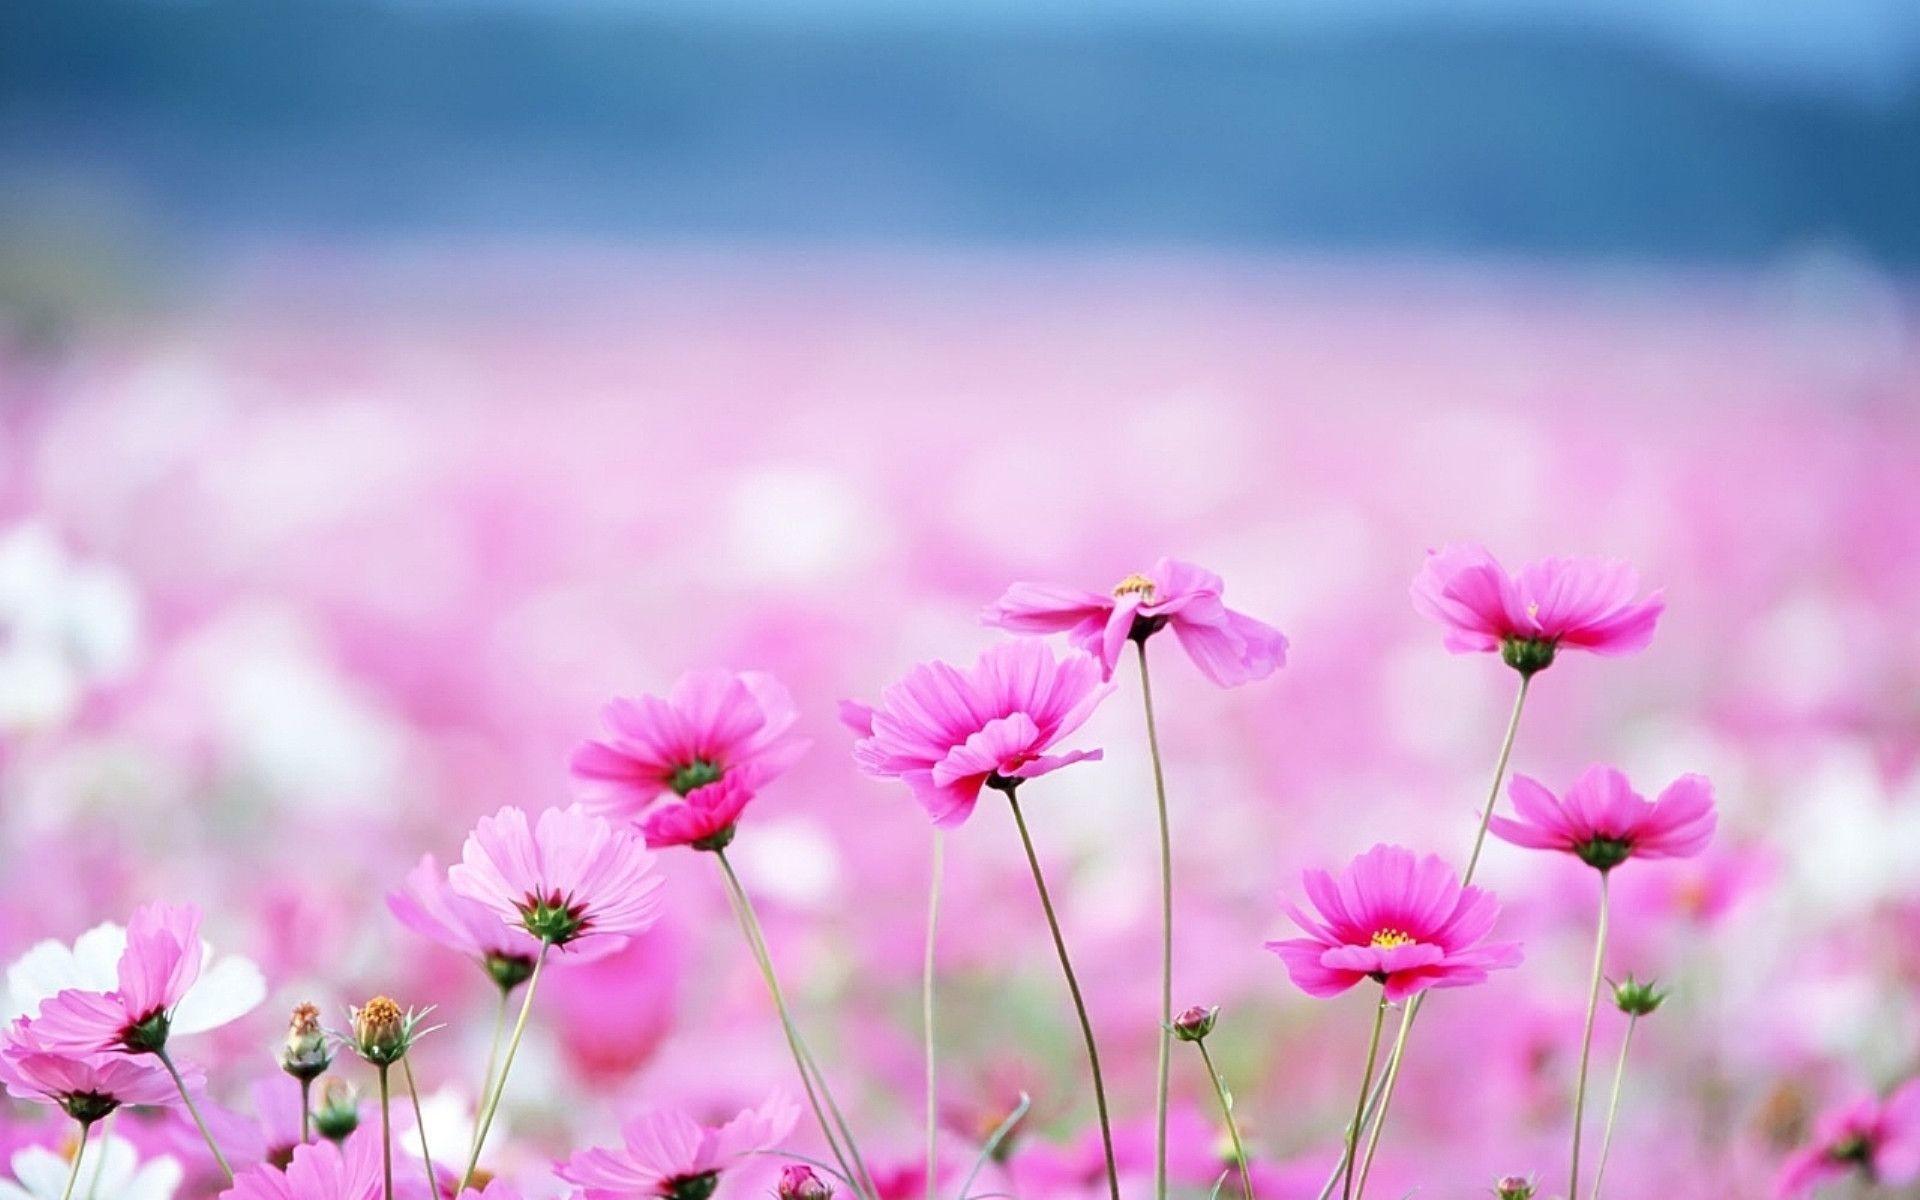 Res: 1920x1200, Download Hd Flower Background Wallpaper Images Backgrounds Floral Desktop  Cave Of Iphone